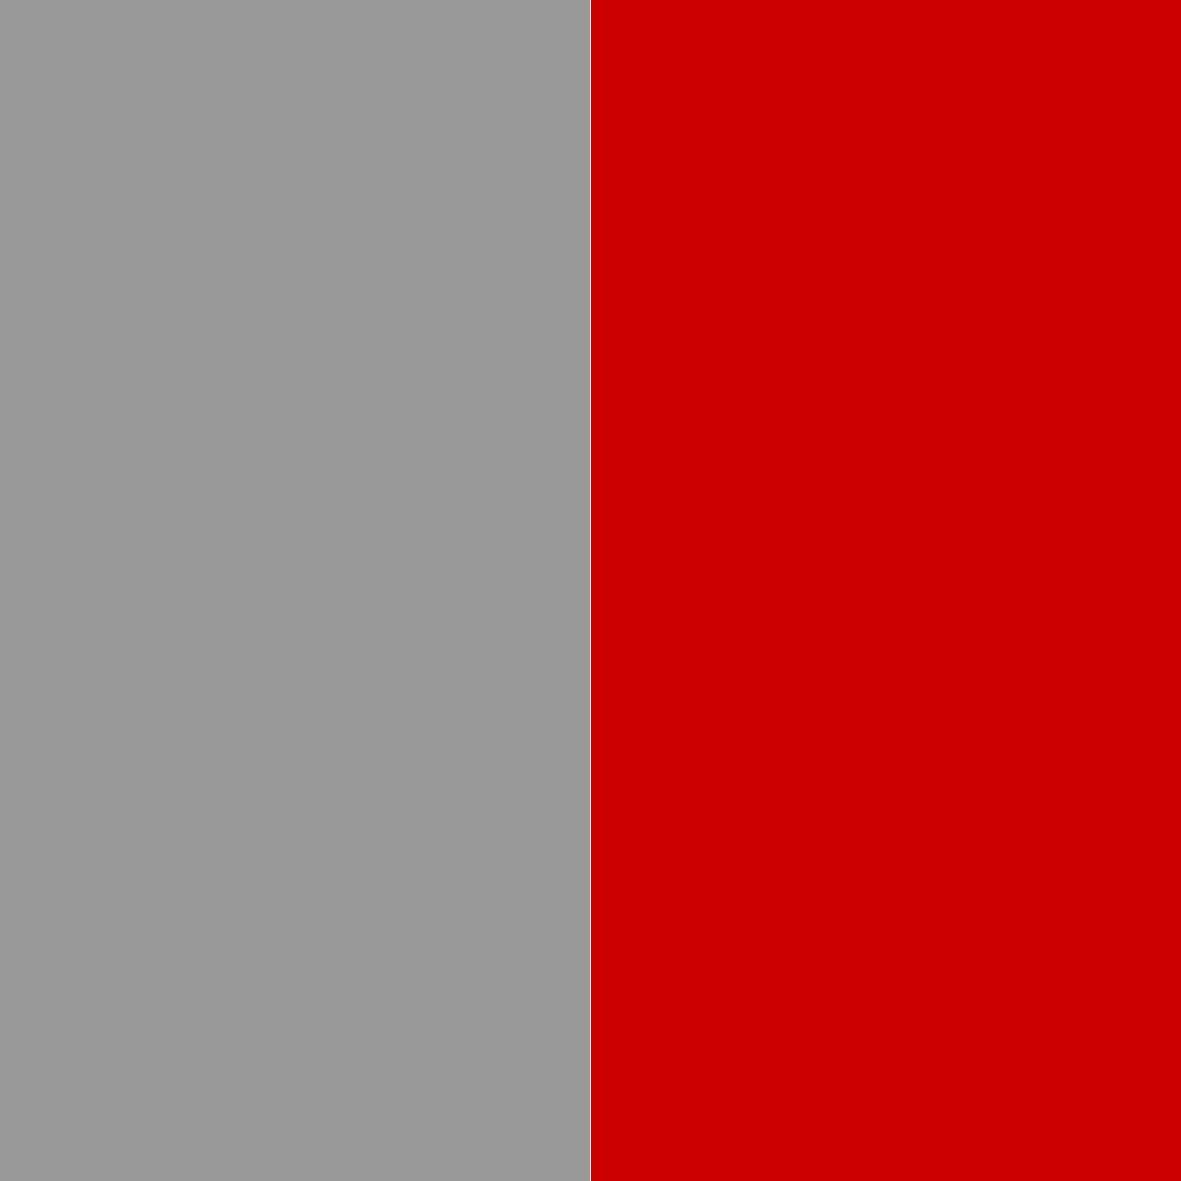 серый/красный_999999/CC0000